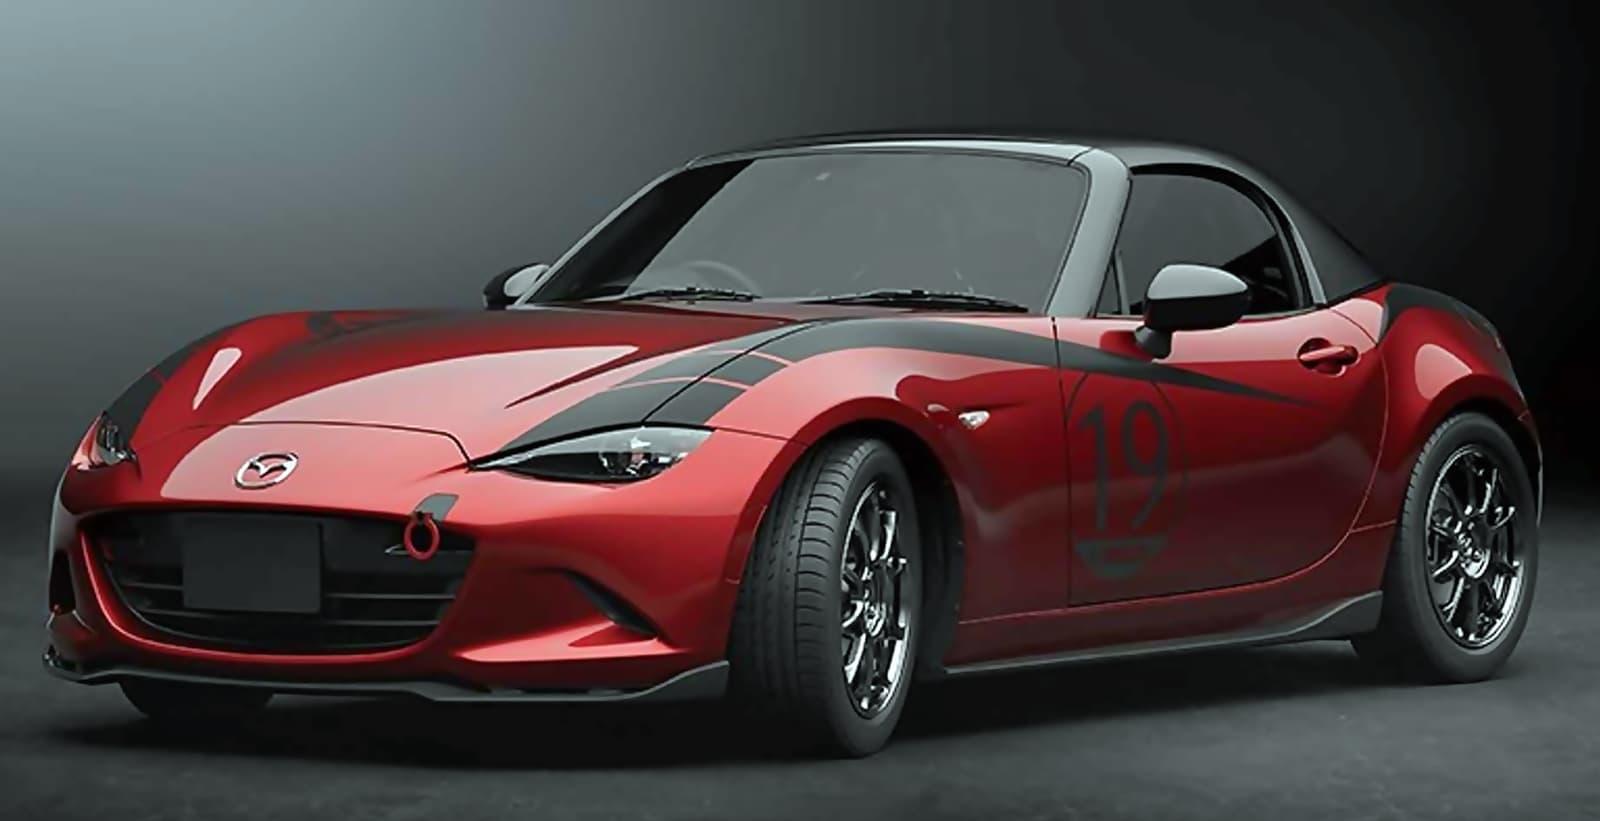 Mazda Mx 5 Roadster Drop Head Coupe Concept 1218 02